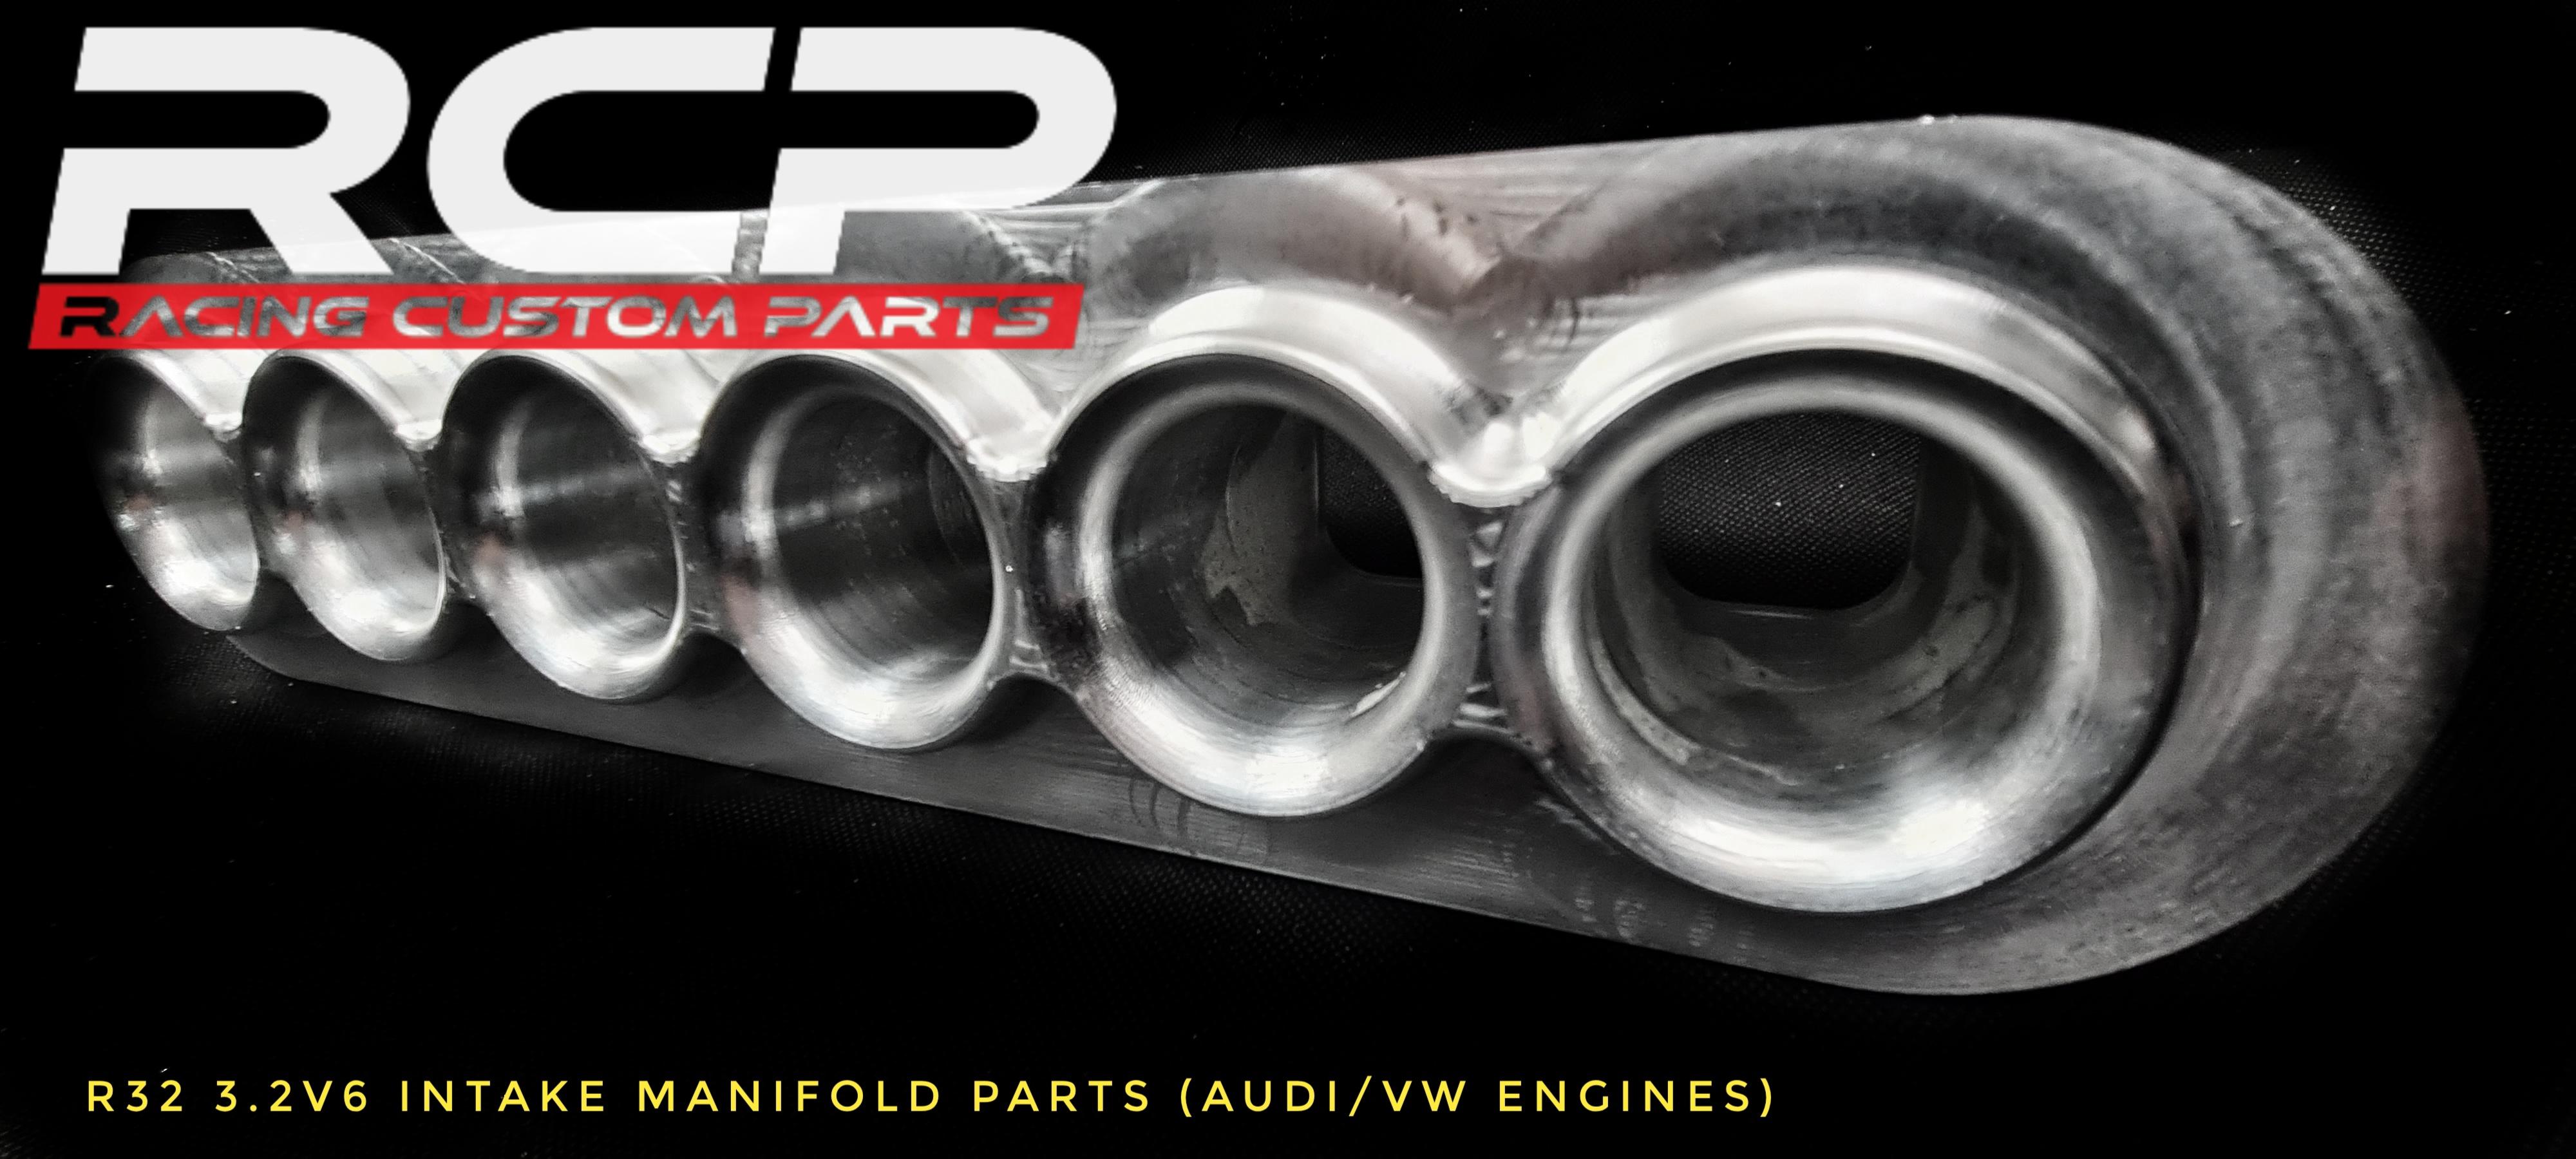 r32 audi vw 3,2v6 engine turbo intake manifold parts welding rcp racing custom parts diy vr6